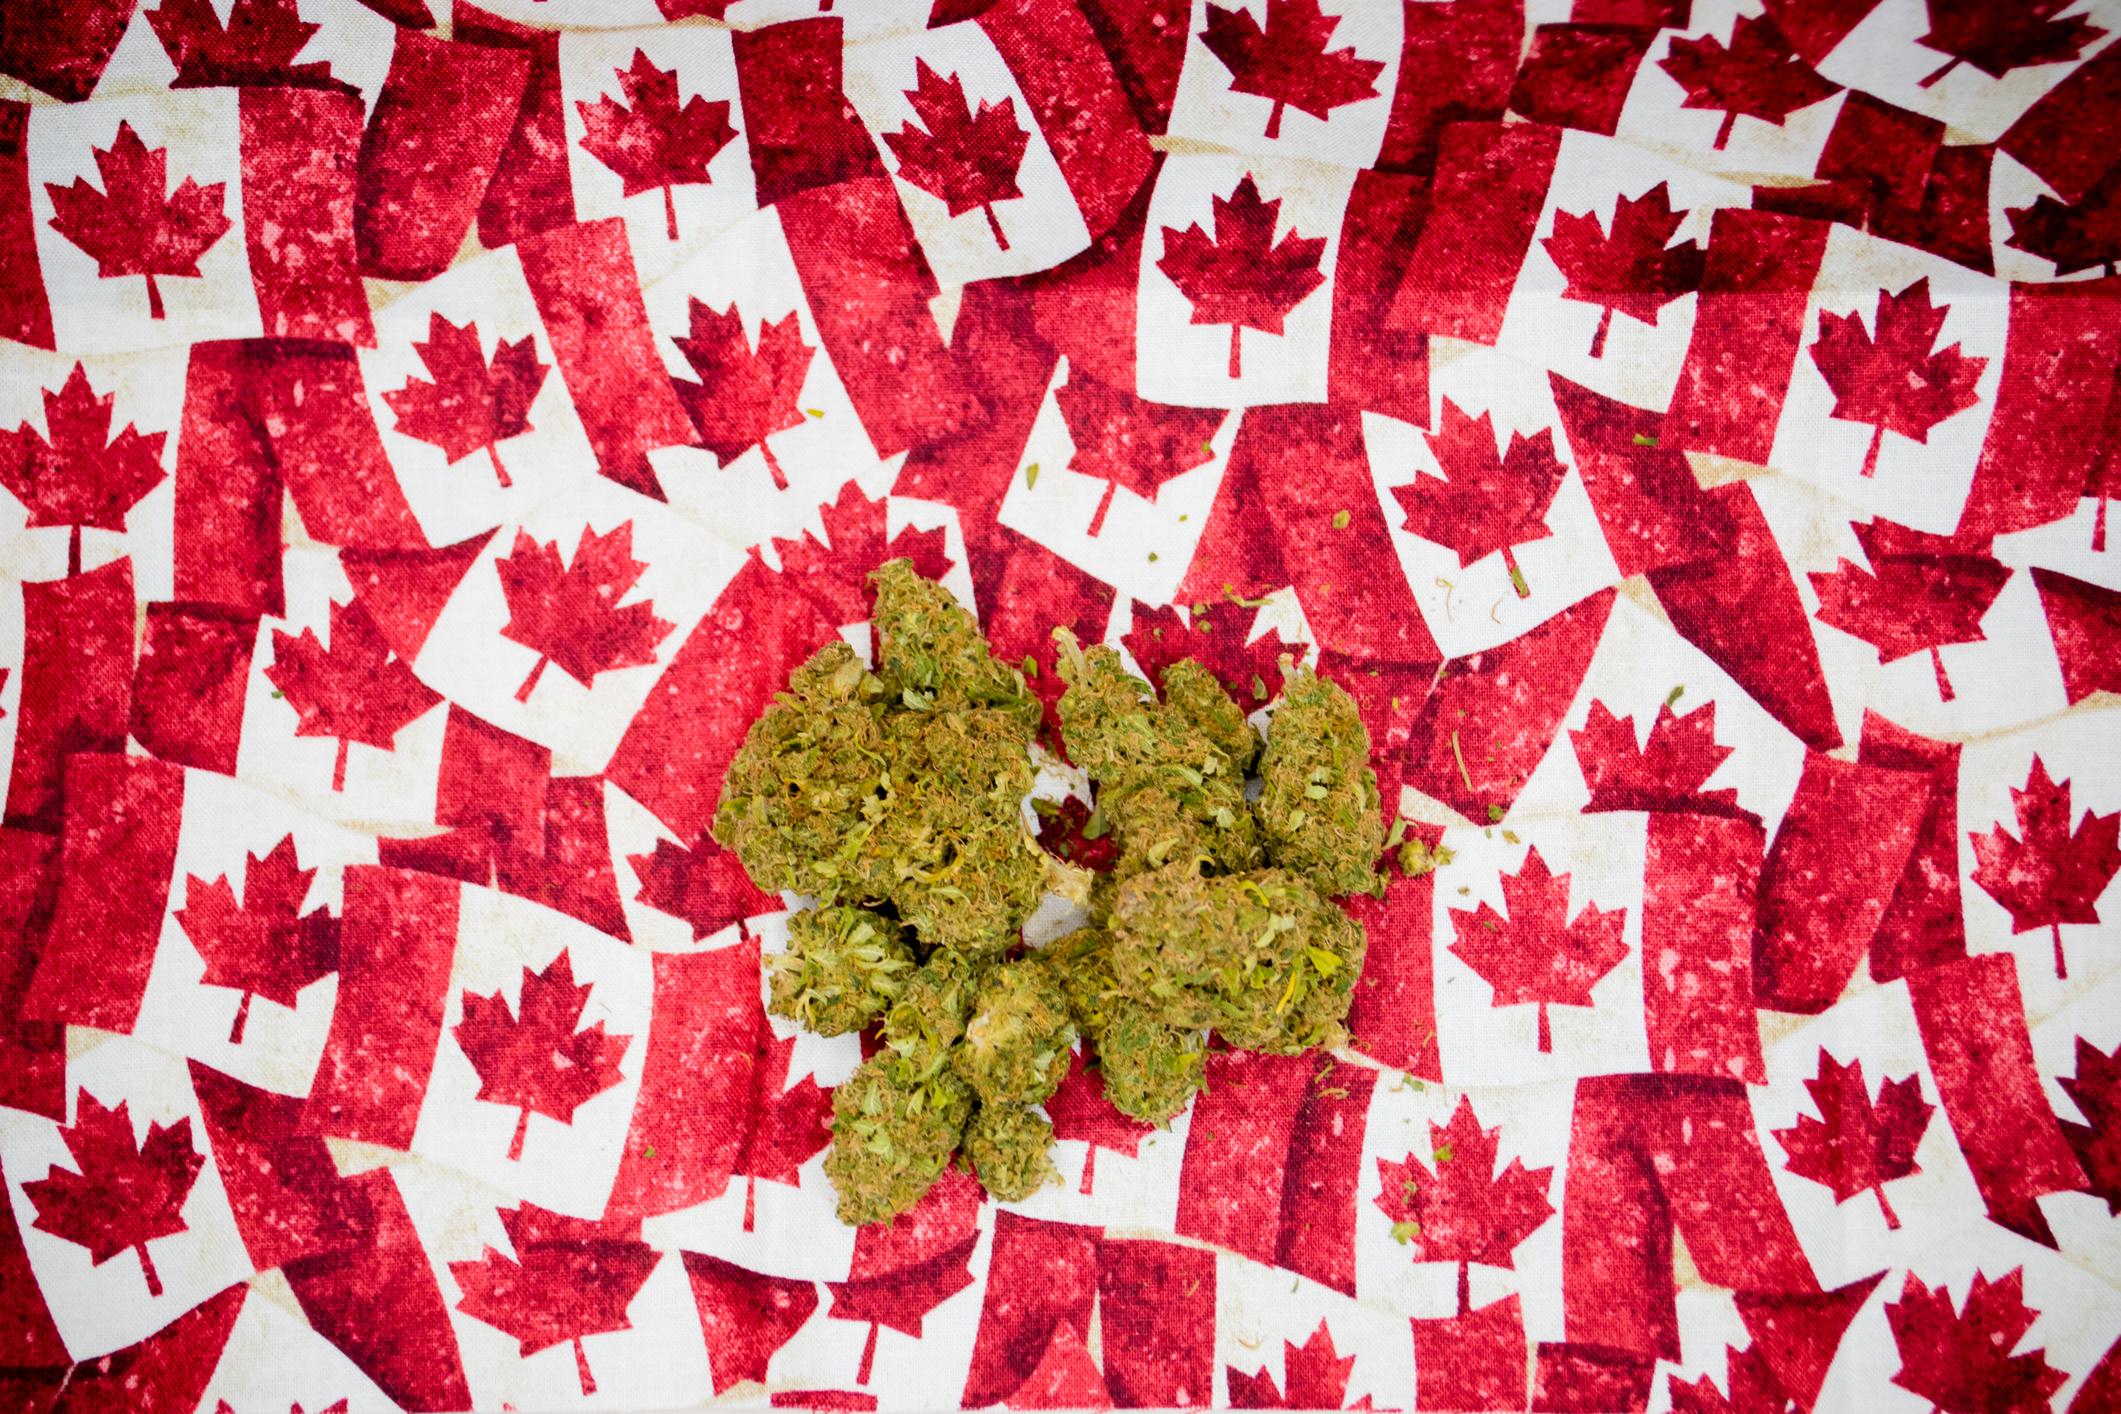 Marijuana buds on top of tiny Canadian flags.